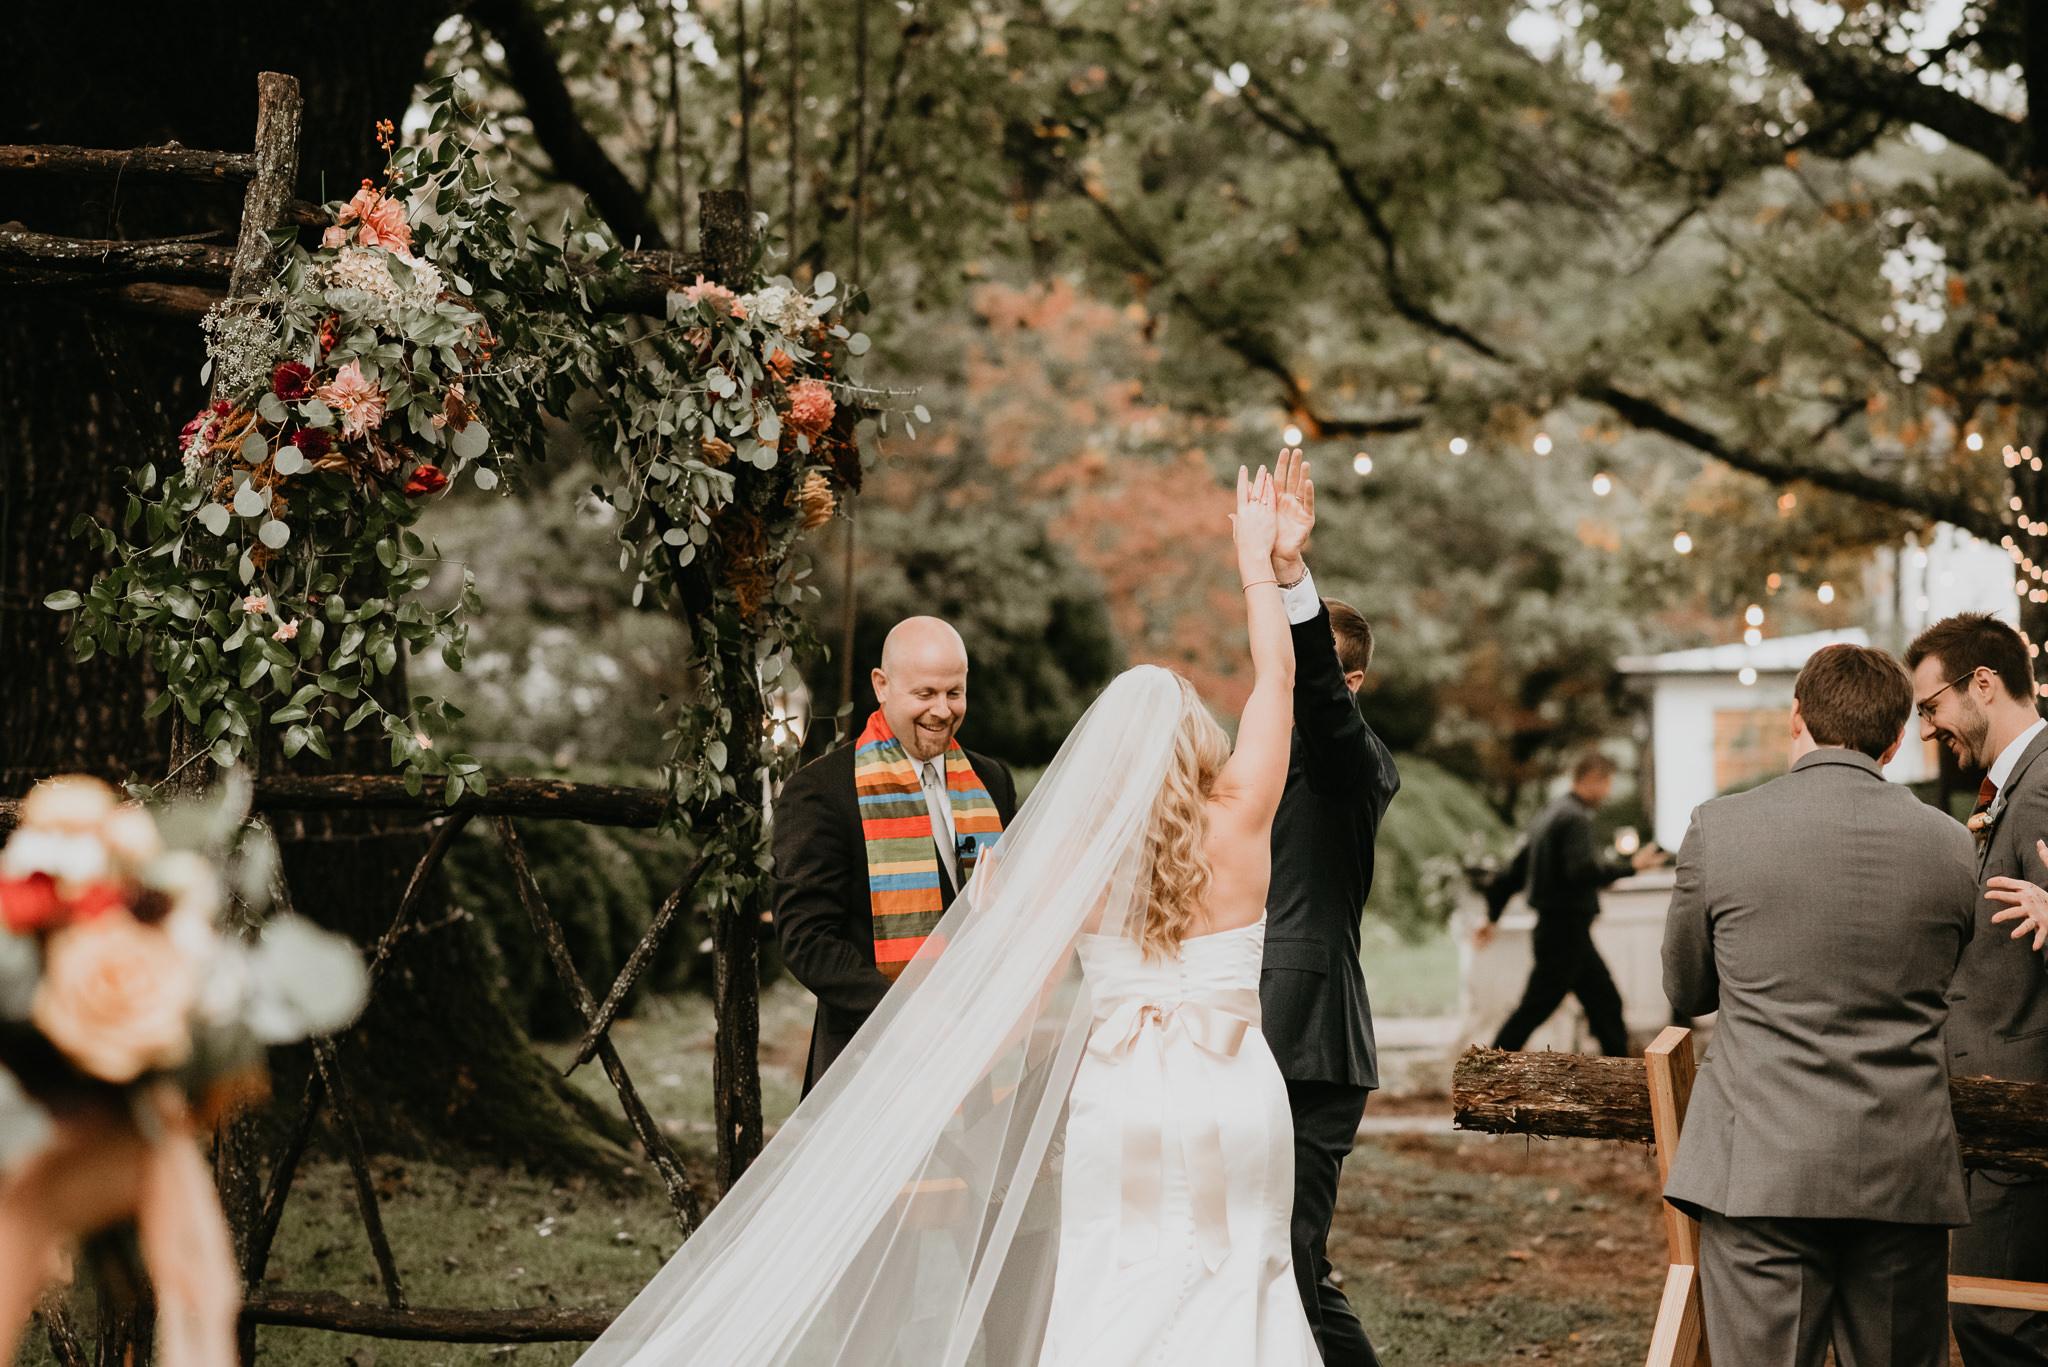 Sundara - Weddings - Virginia - Best Wedding Photographer - Pat Cori Photography-51.jpg